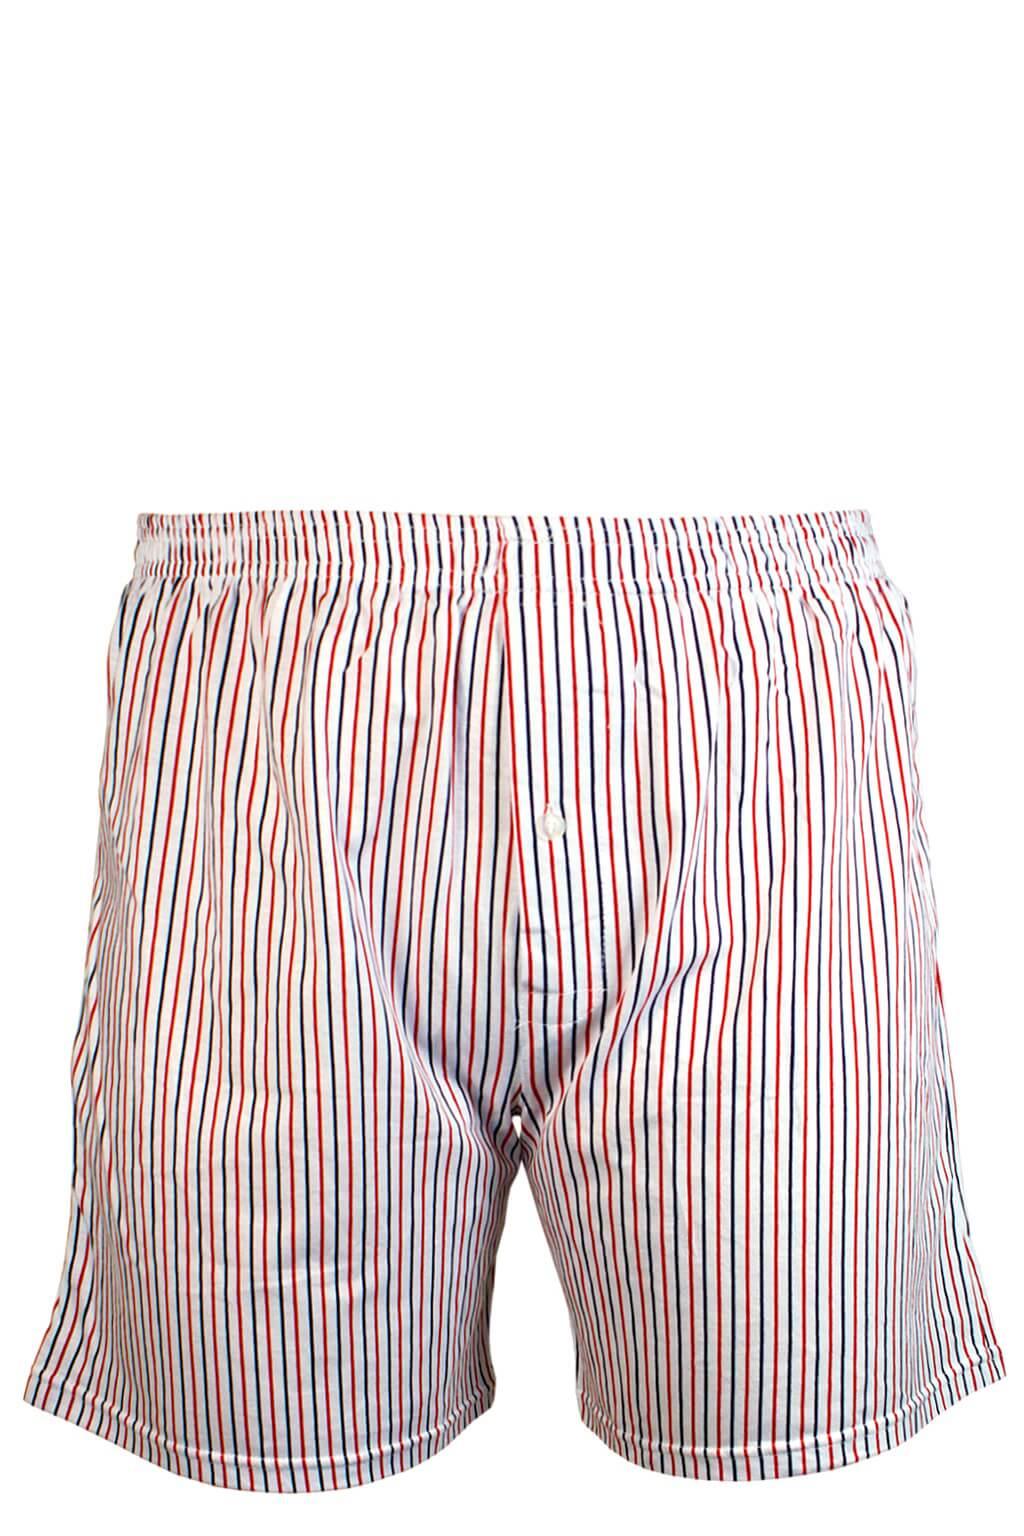 Onyx bavlněné trenky s delší nohavičkou 3XL bílá 6878770e89